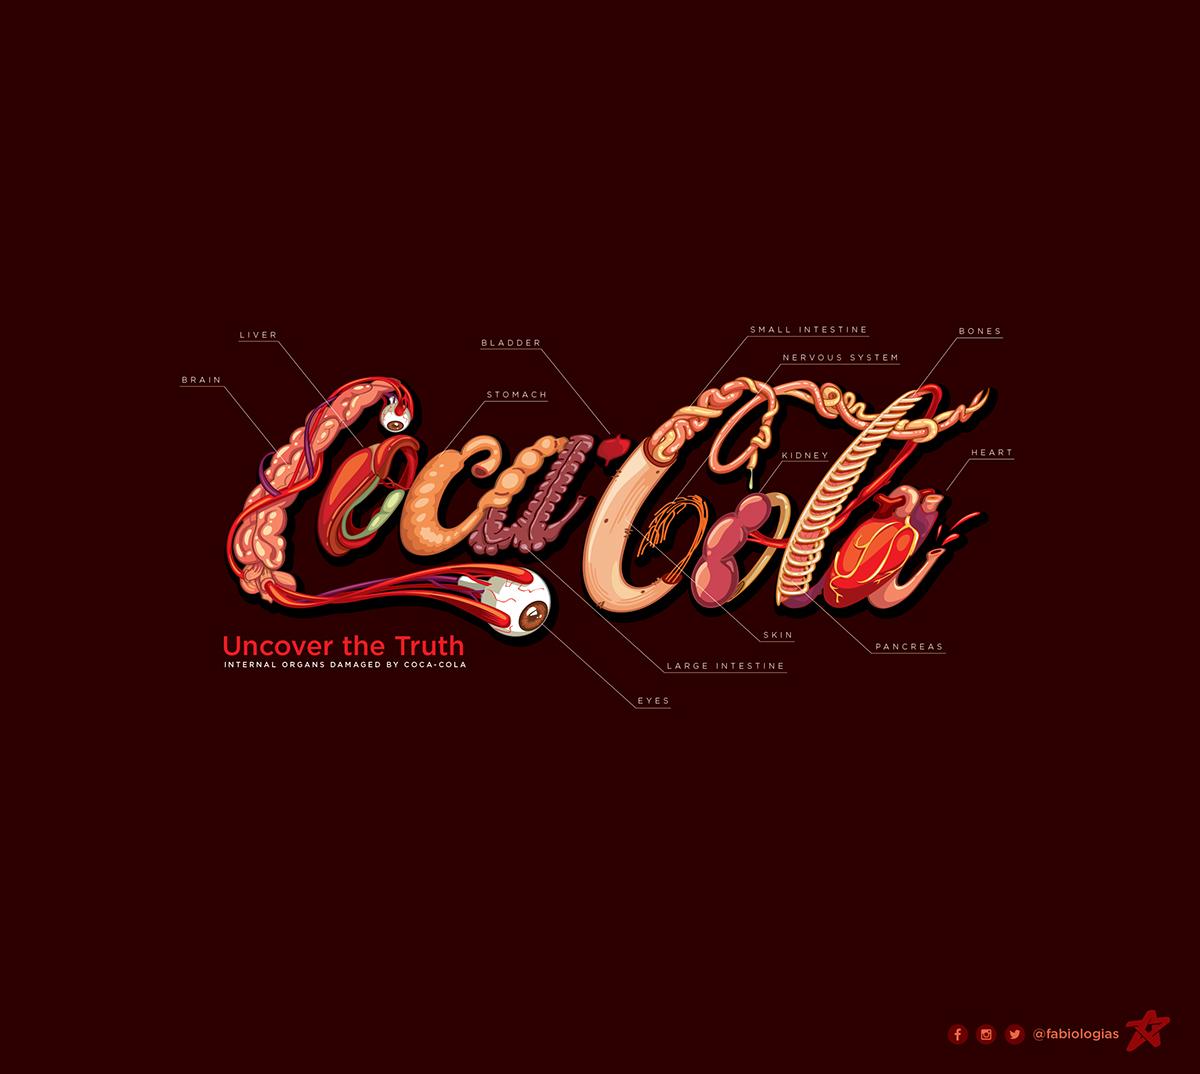 Le logo de Coca-Cola recréé avec des organes du corps humain !